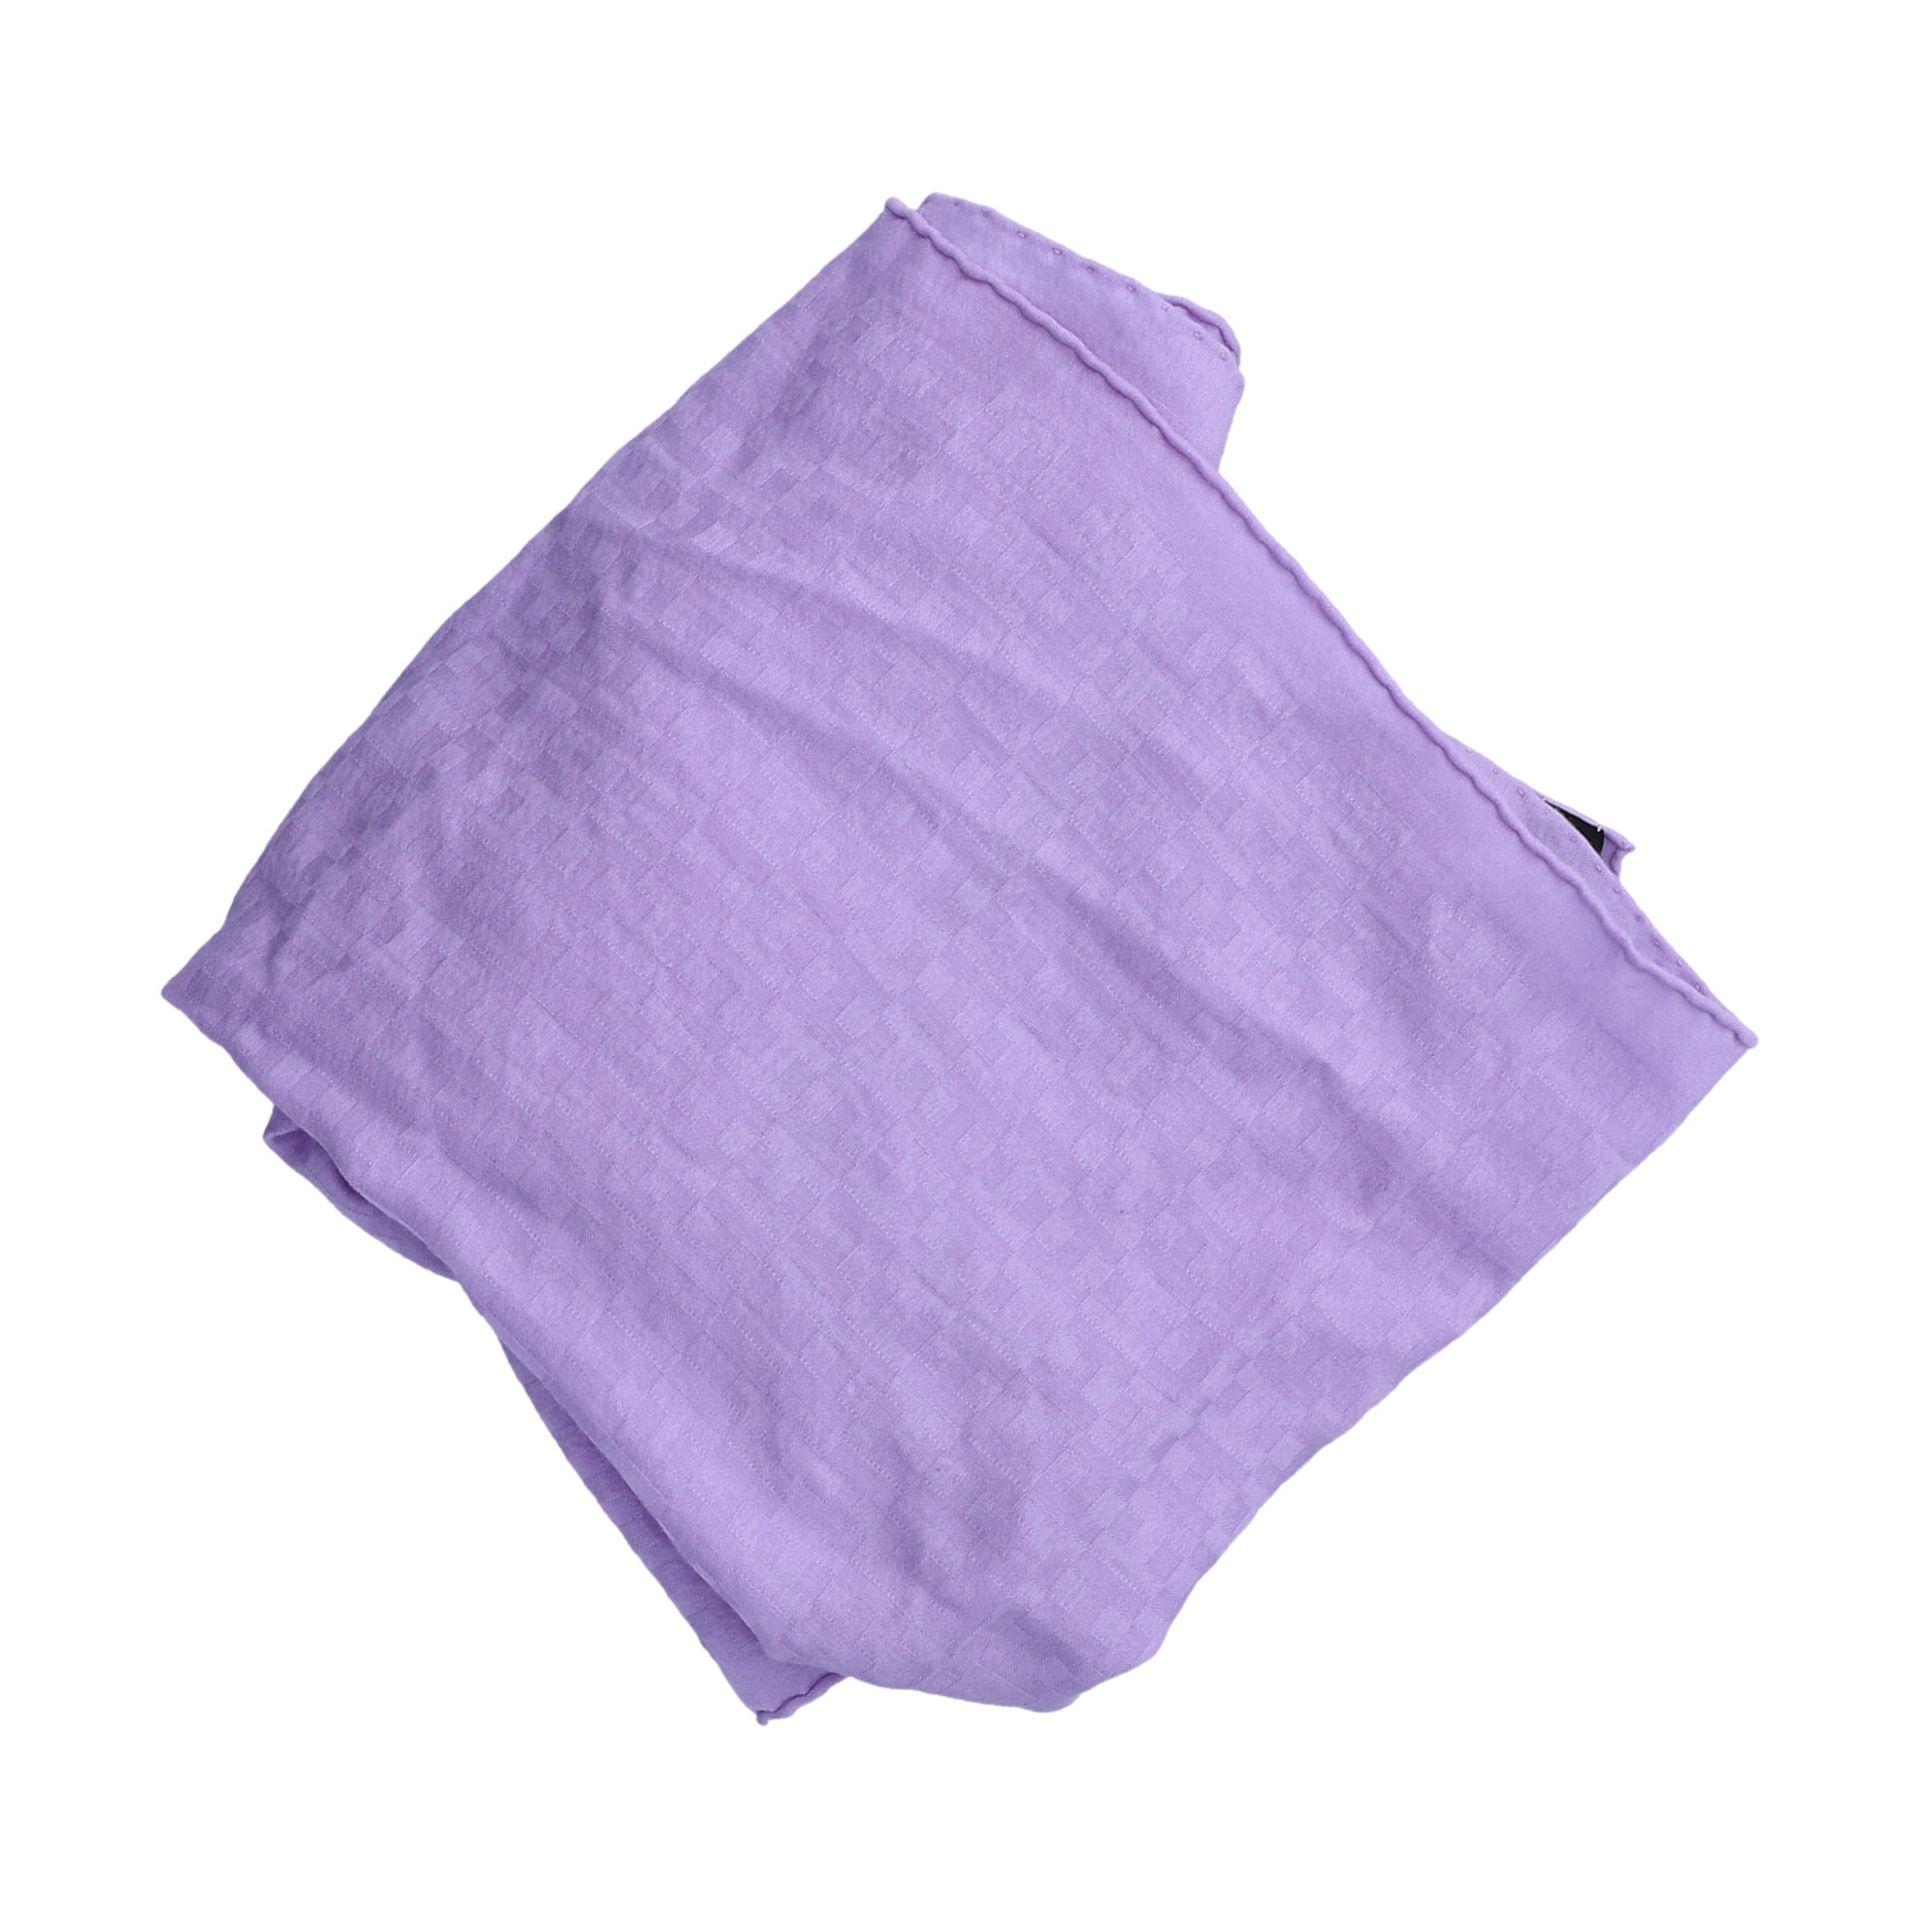 HERMÈS Langschal. 70% Kaschmir, 30% Seide in Violett mit H-Logo Struktur. 47cmx120cm. - Image 3 of 3